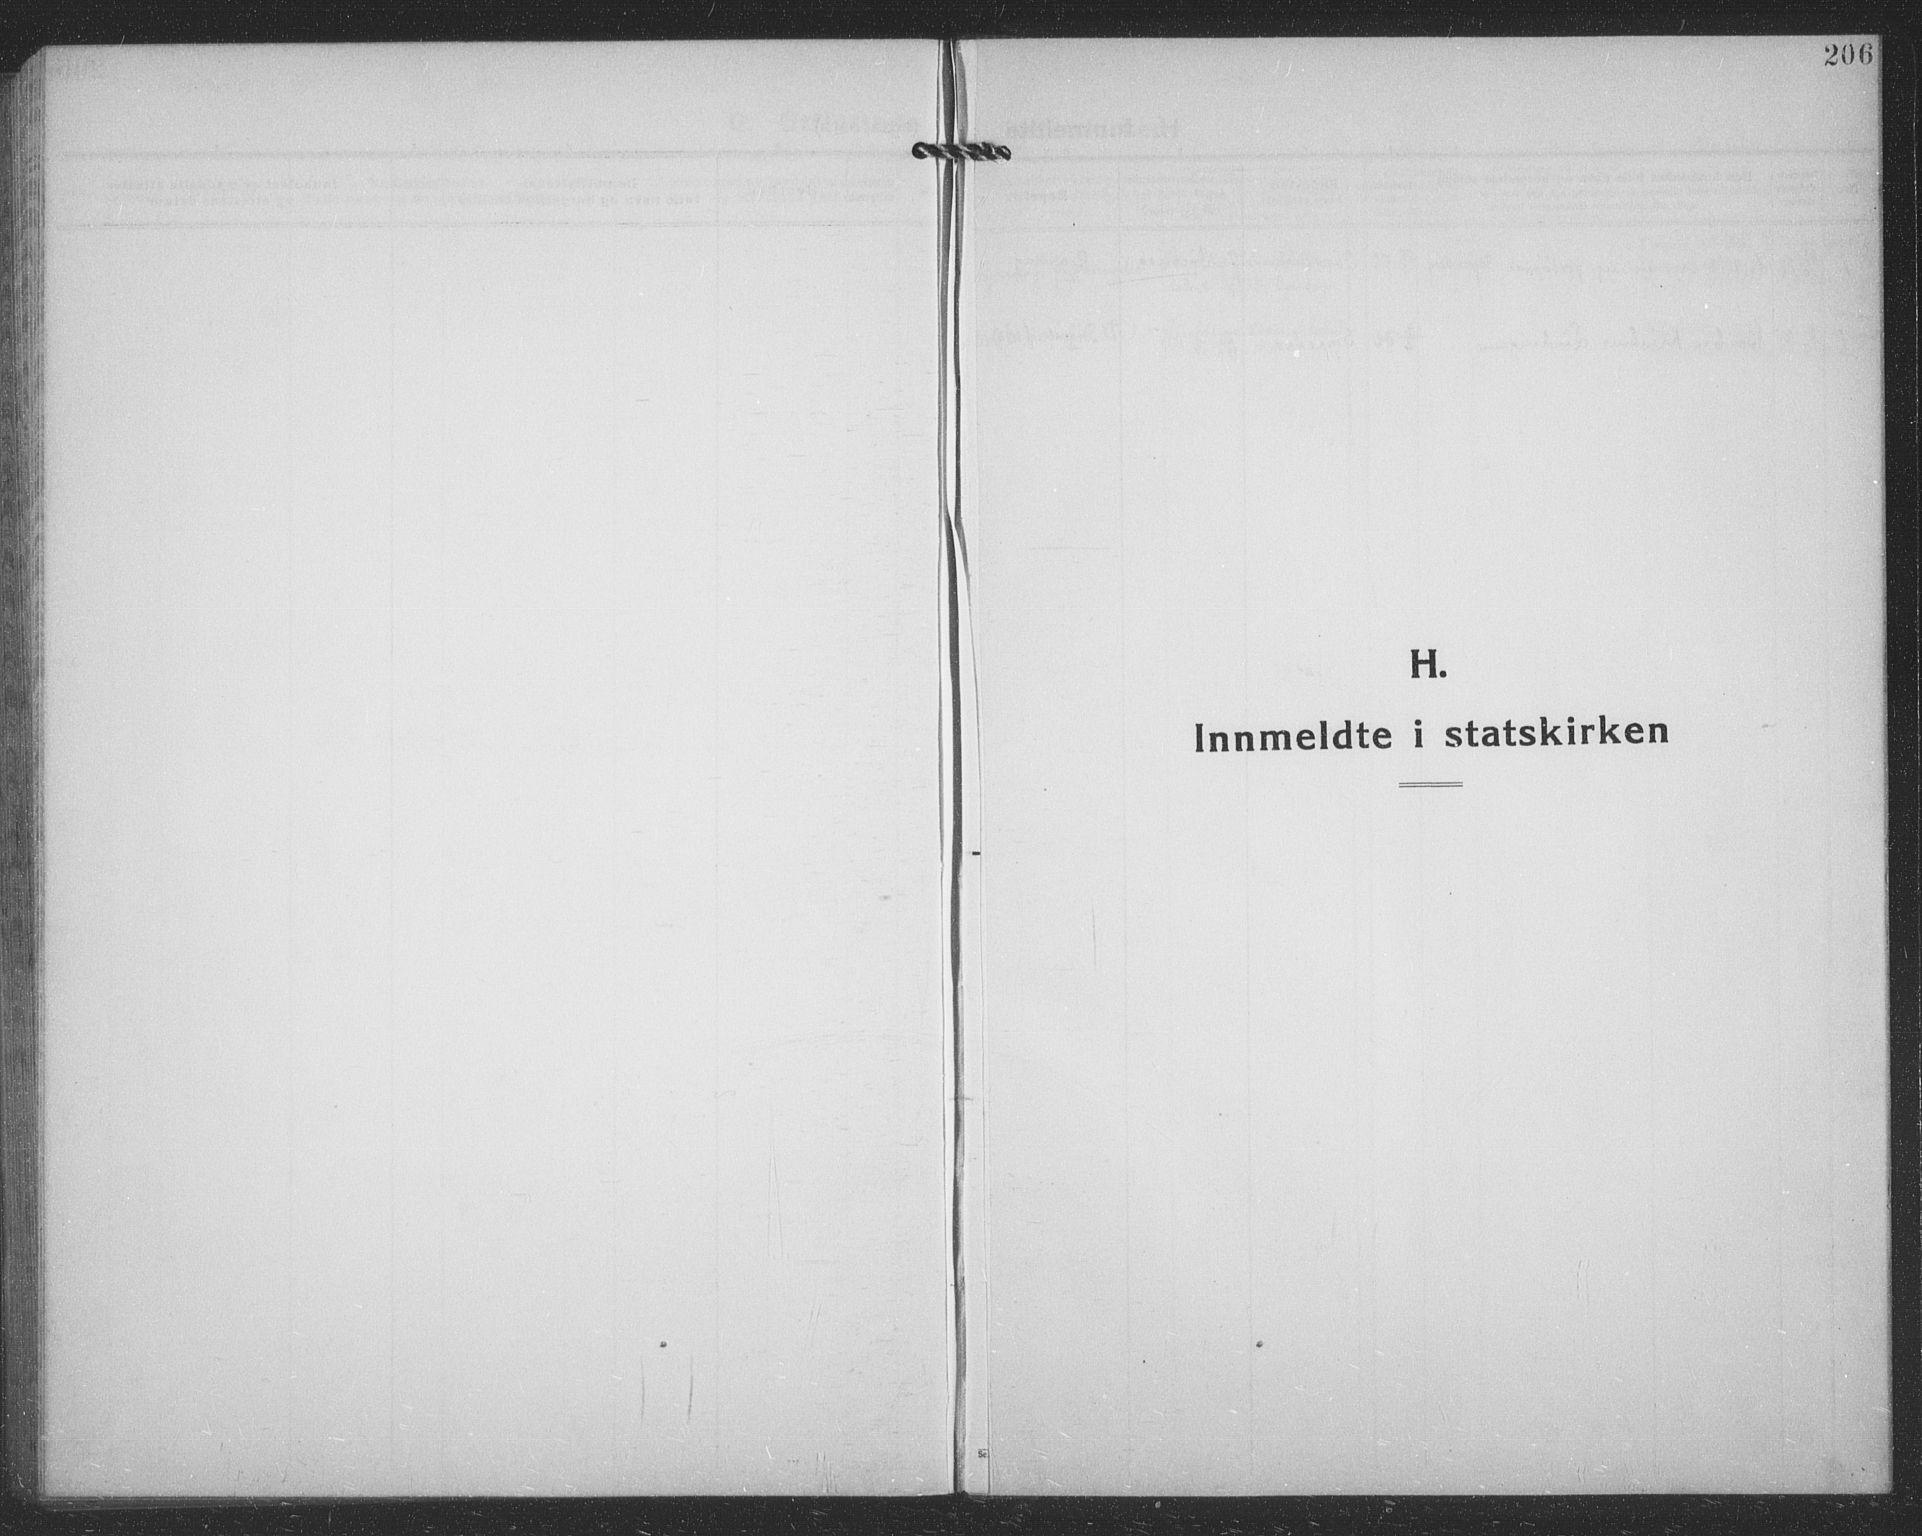 SATØ, Tranøy sokneprestkontor, I/Ia/Iab/L0024klokker: Klokkerbok nr. 24, 1929-1943, s. 206